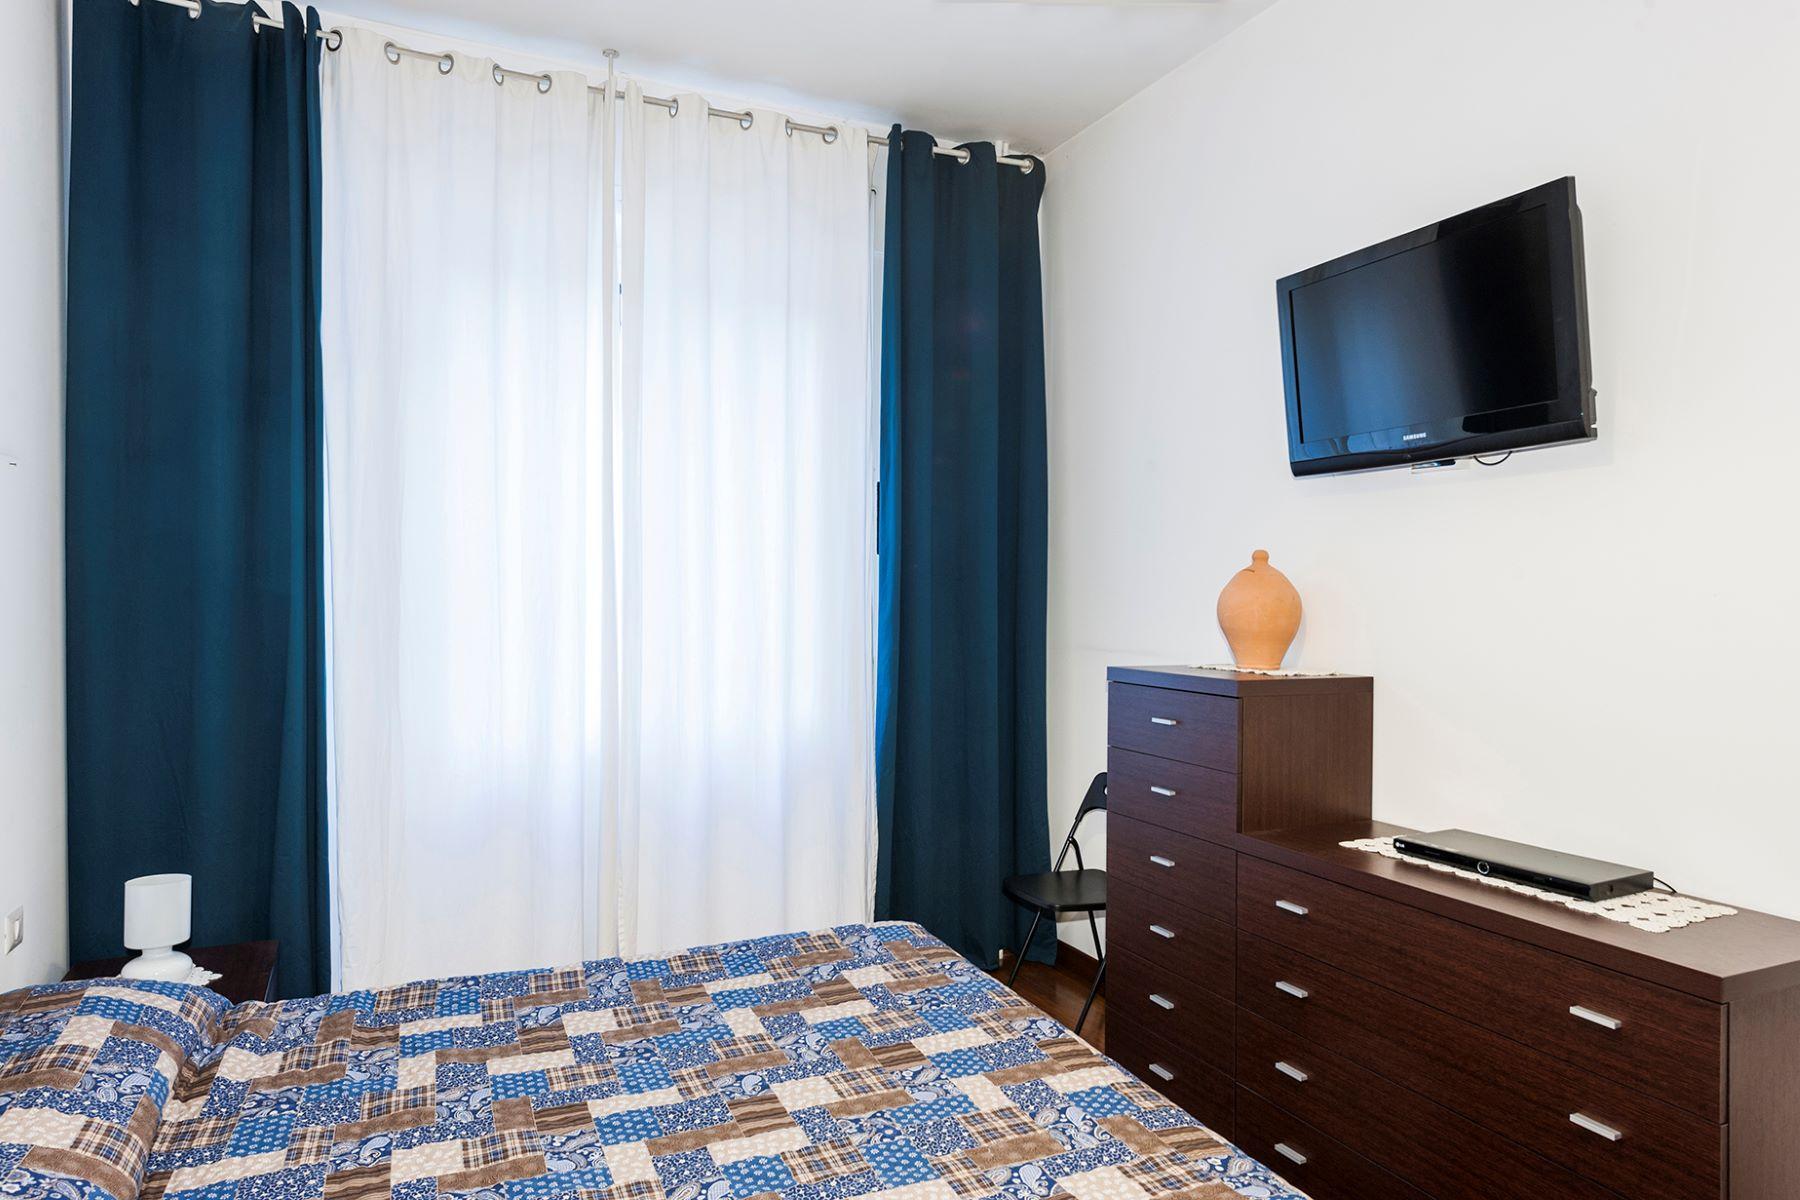 Additional photo for property listing at Renovated apartment in the Prati neighborhood Via Costabella Rome, Roma 00195 Italia